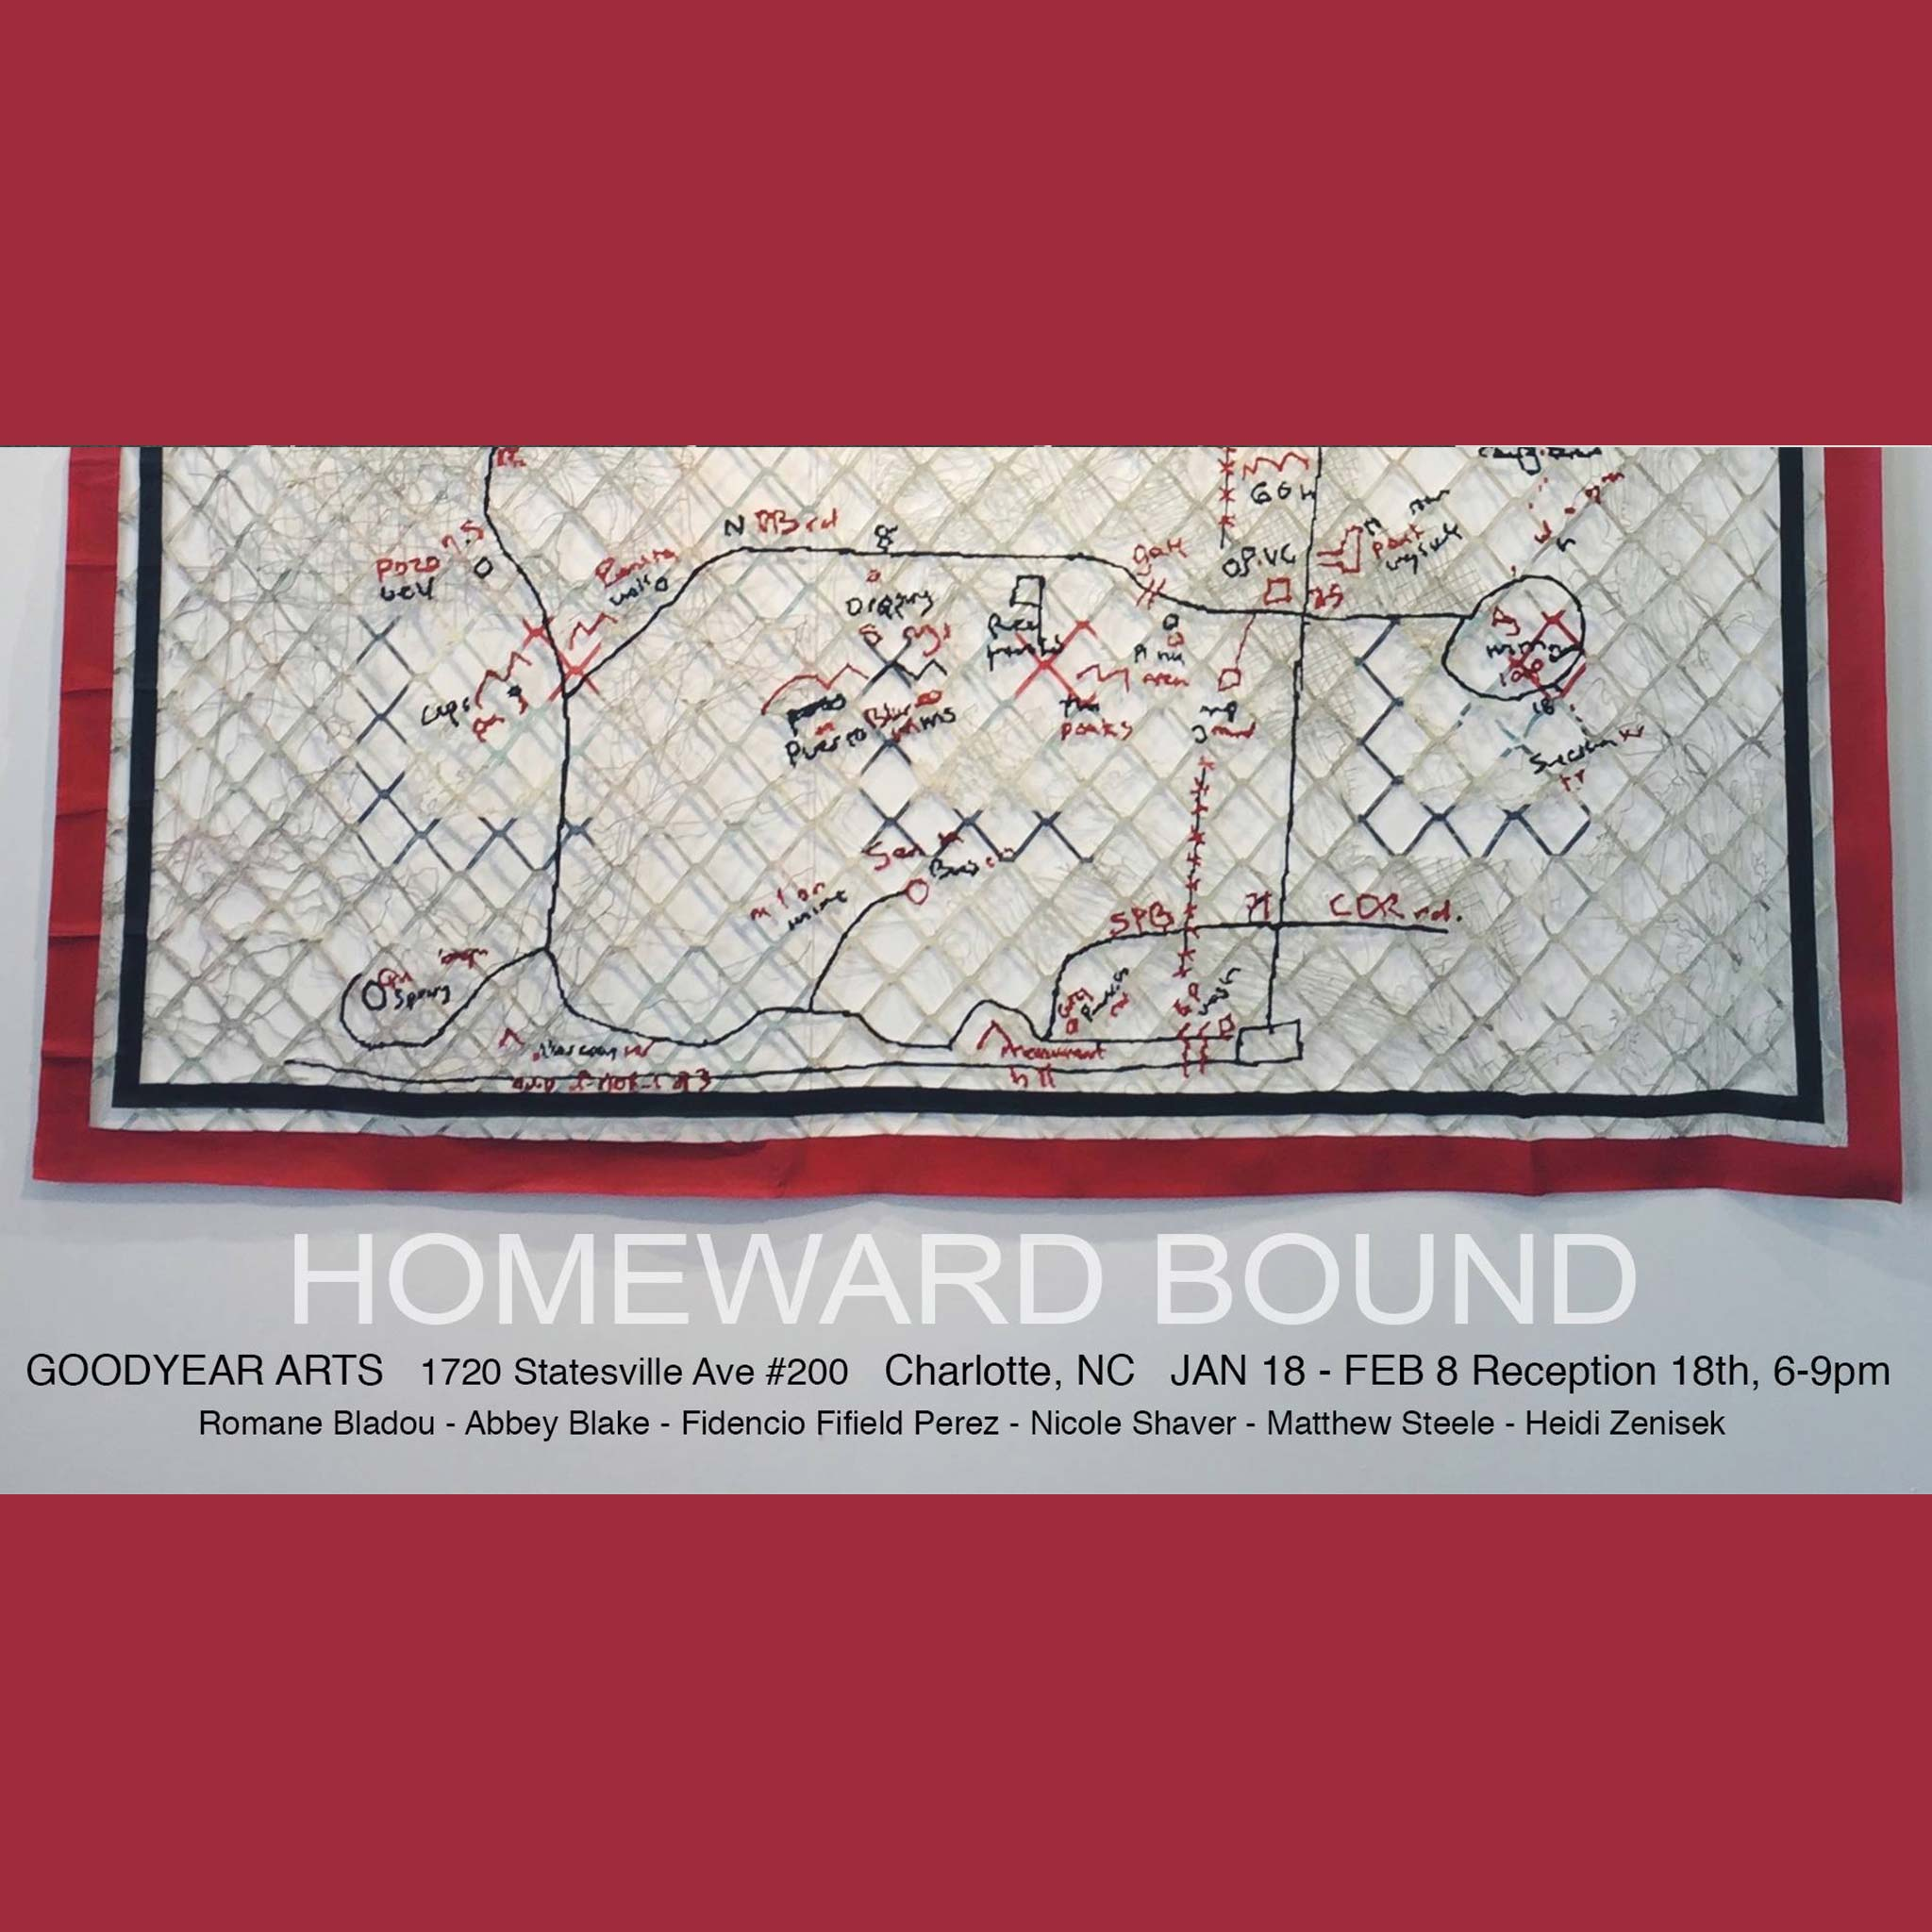 Homeward Bound - JAN 18 - FEB 8Opening Jan 18 // 6-9 PM